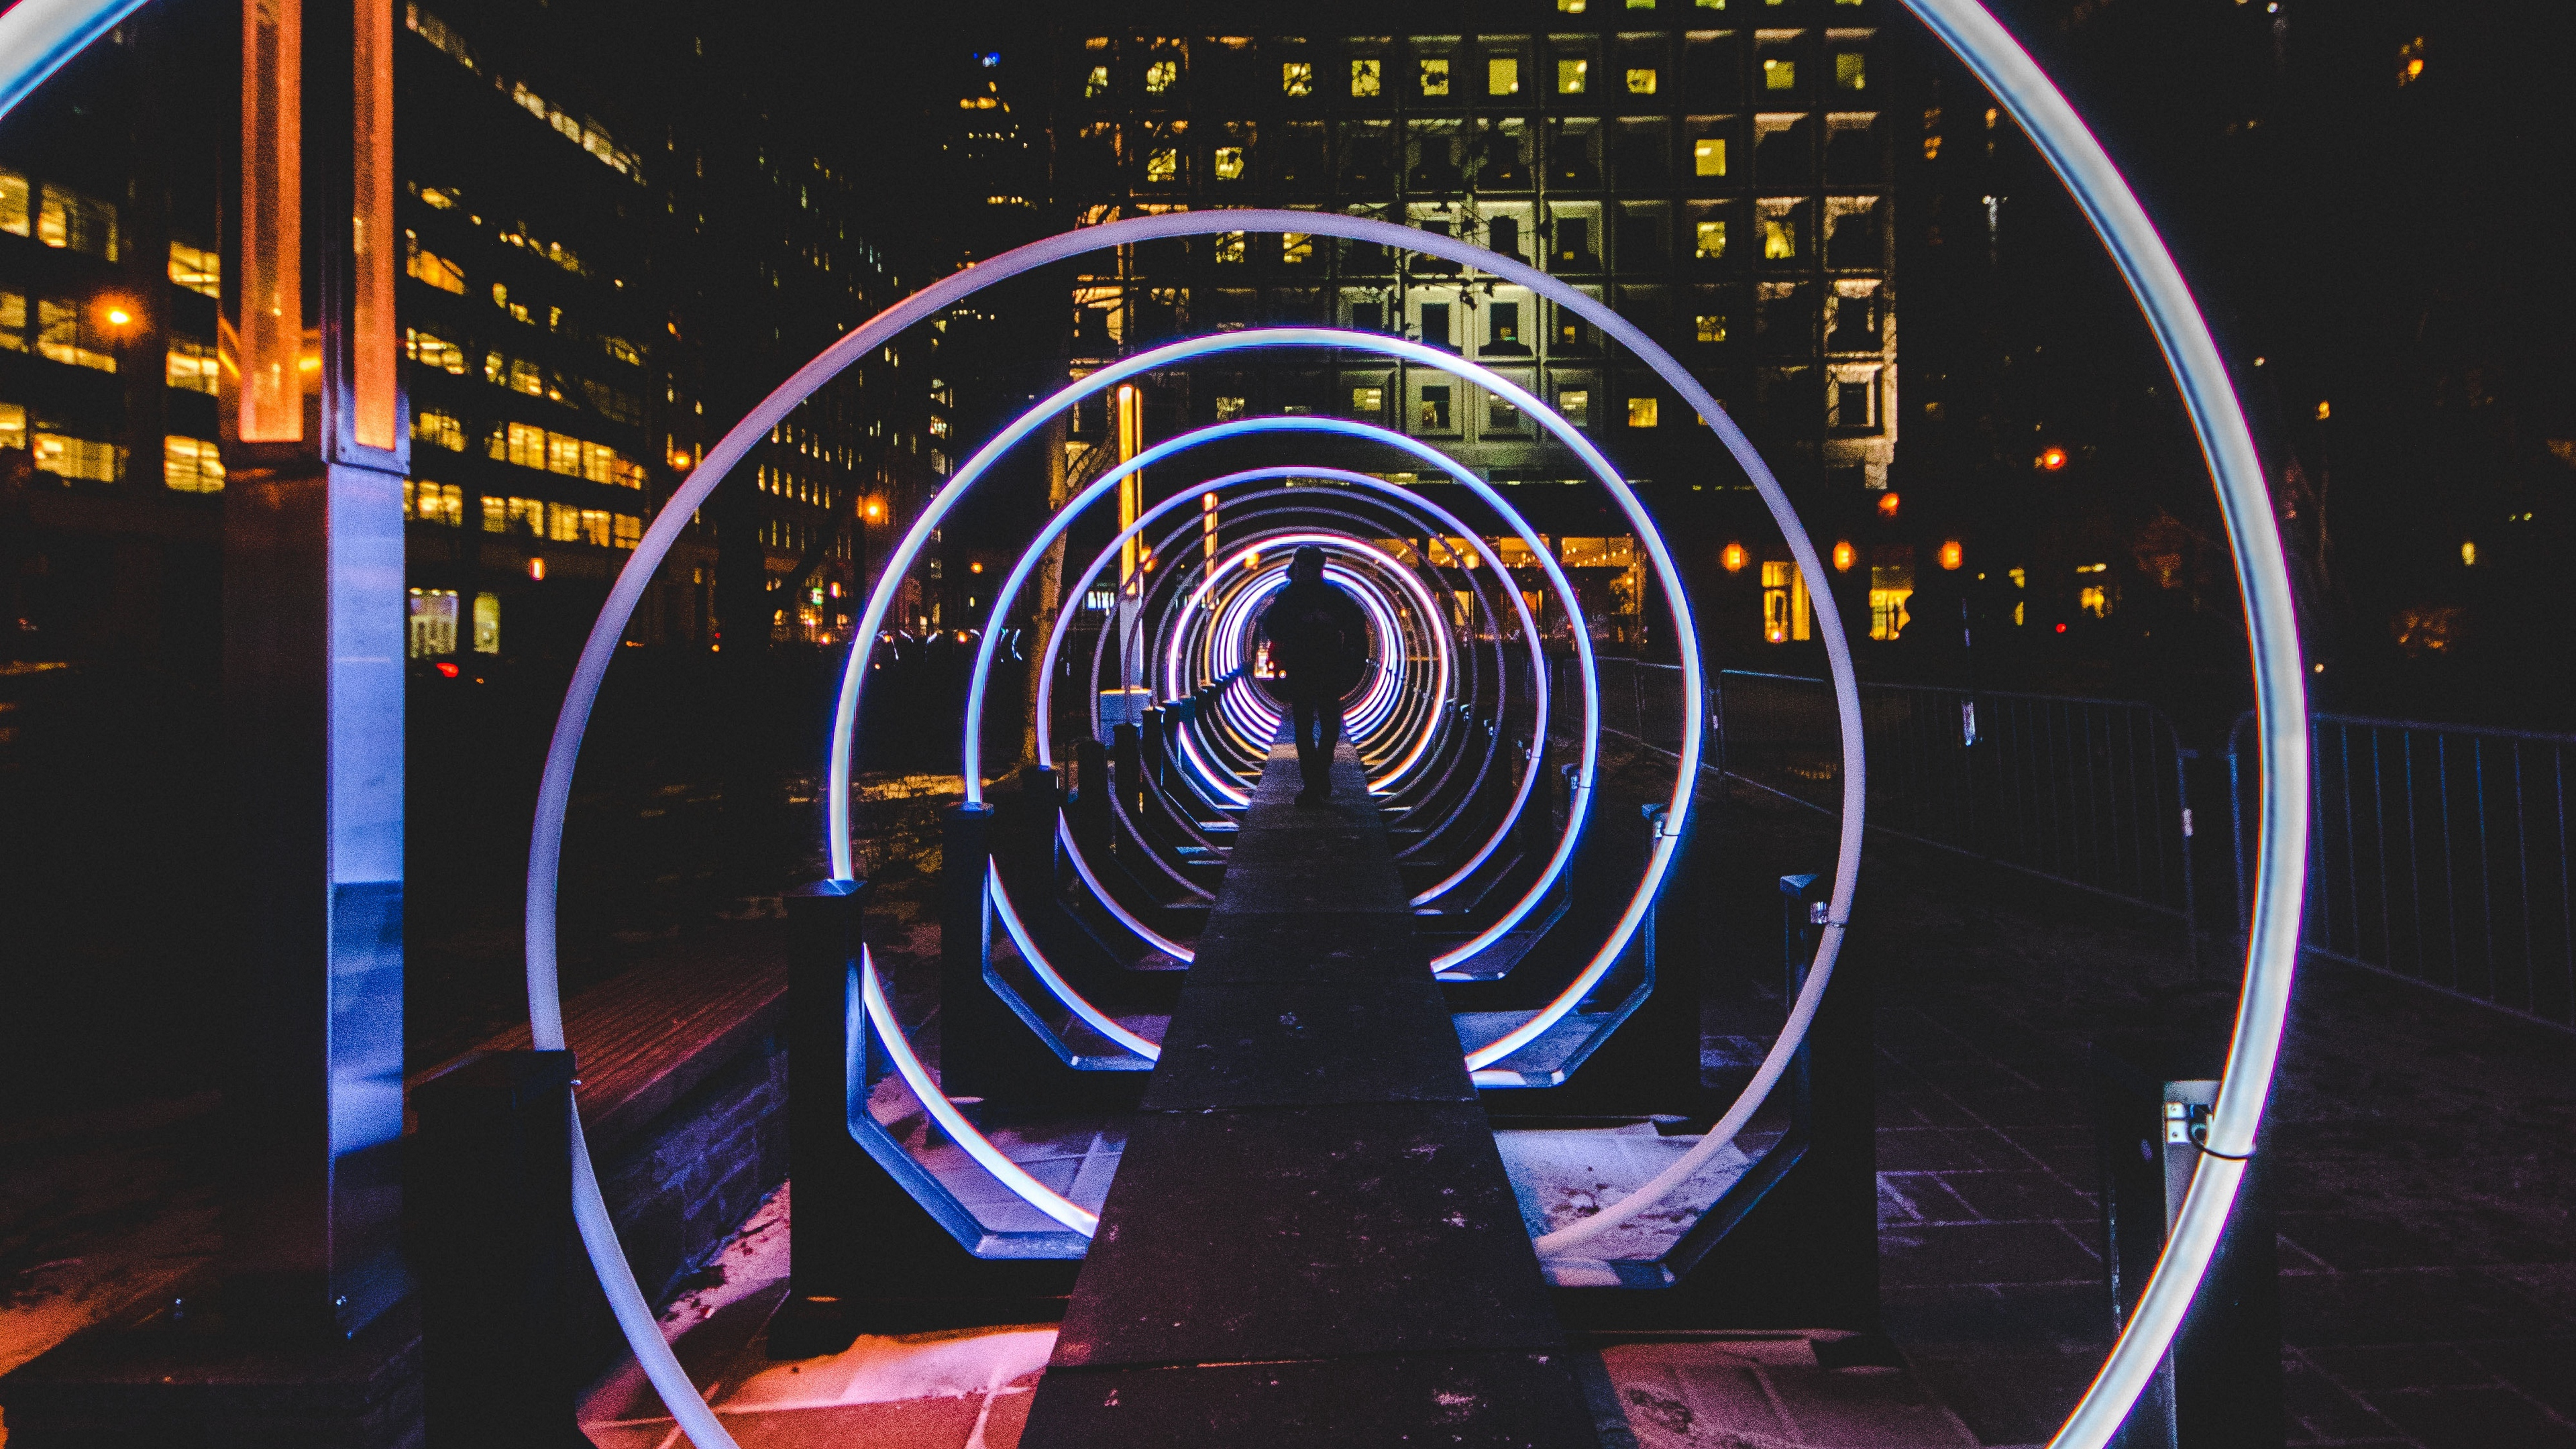 man silhouette tunnel city night 4k 1538068001 - man, silhouette, tunnel, city, night 4k - Tunnel, Silhouette, Man